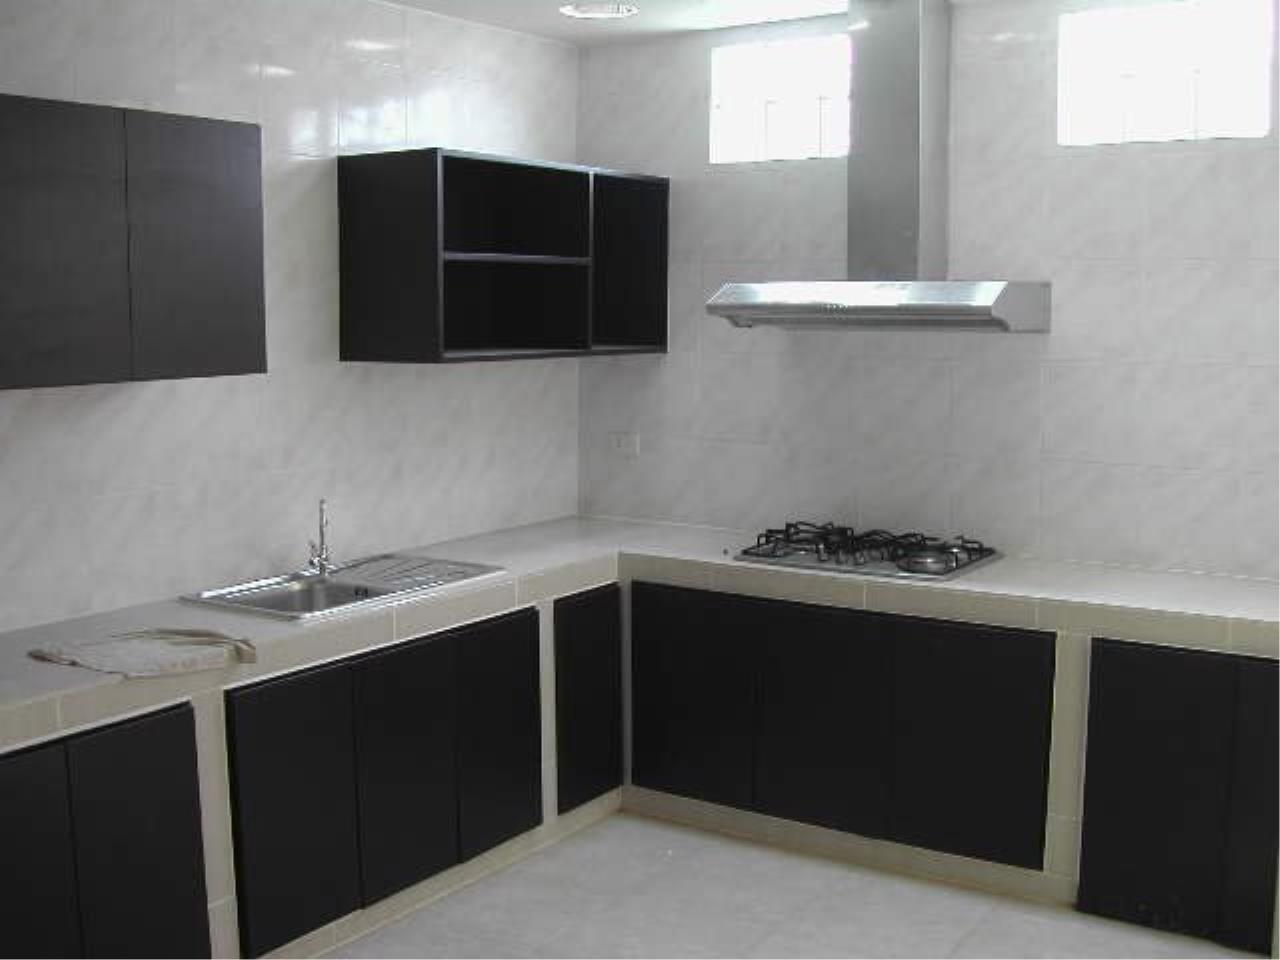 Piri Property Agency's Spacious 5 Bedrooms Townhouse in Sukumvit for sale 11